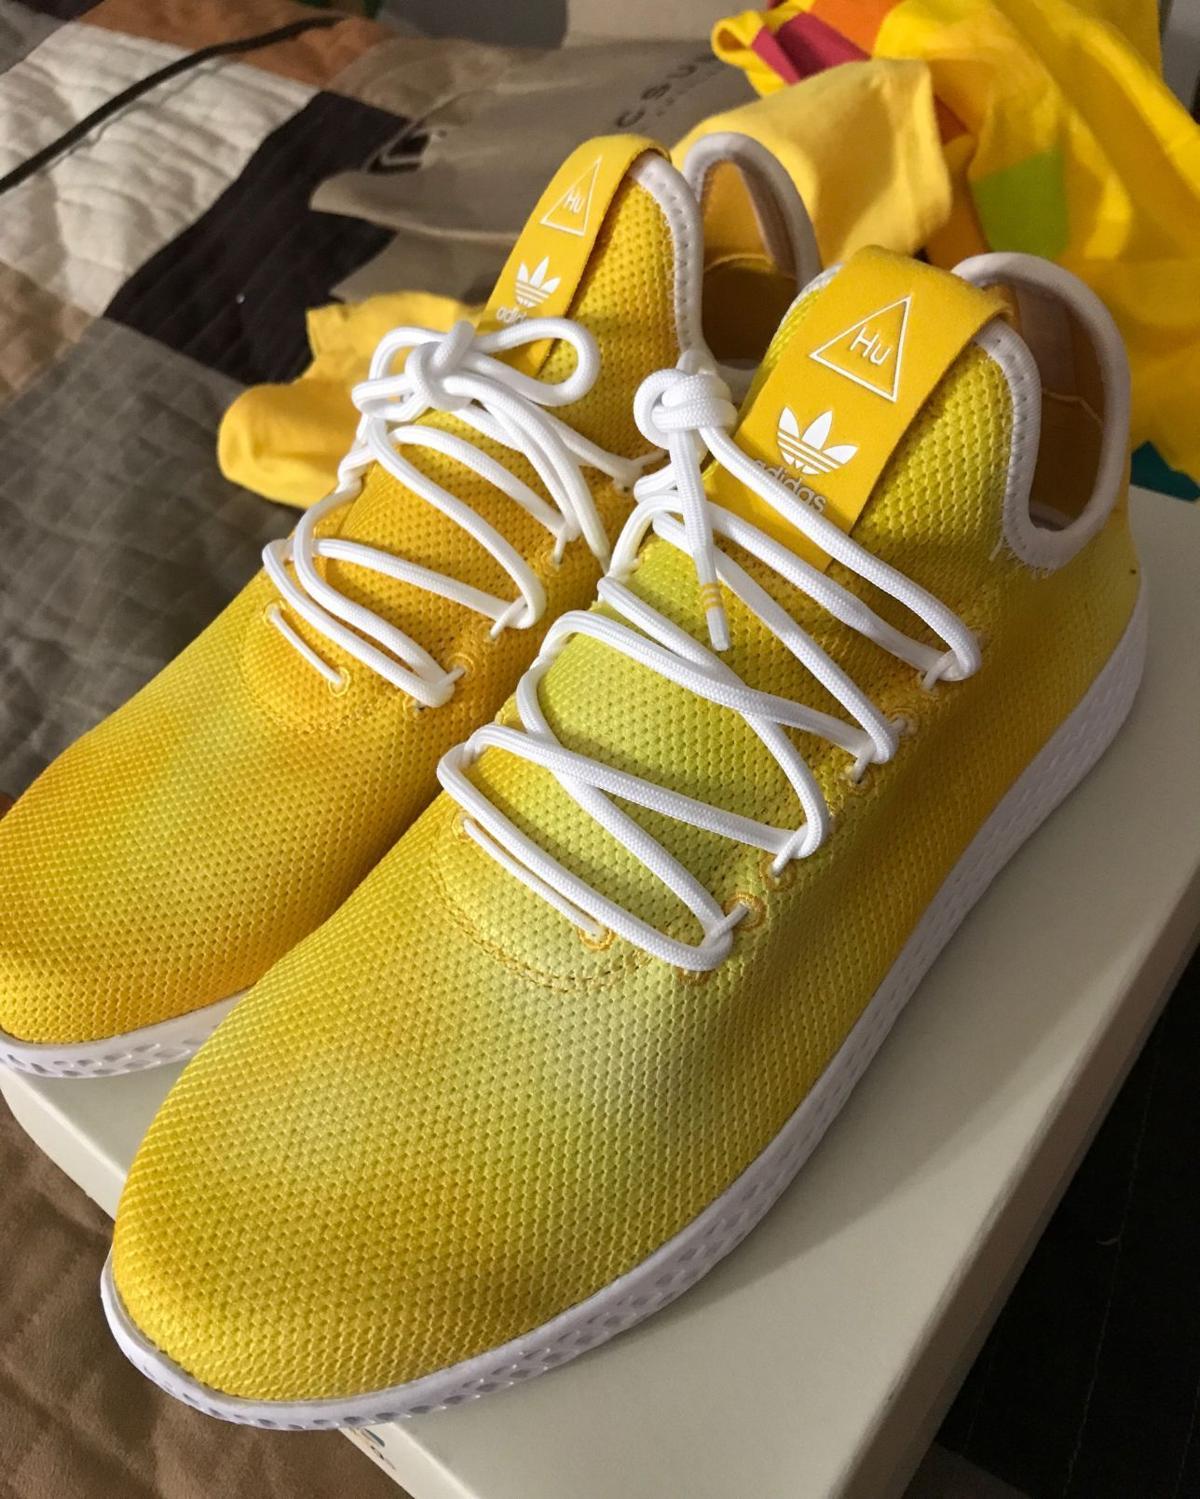 Adidas Hu's